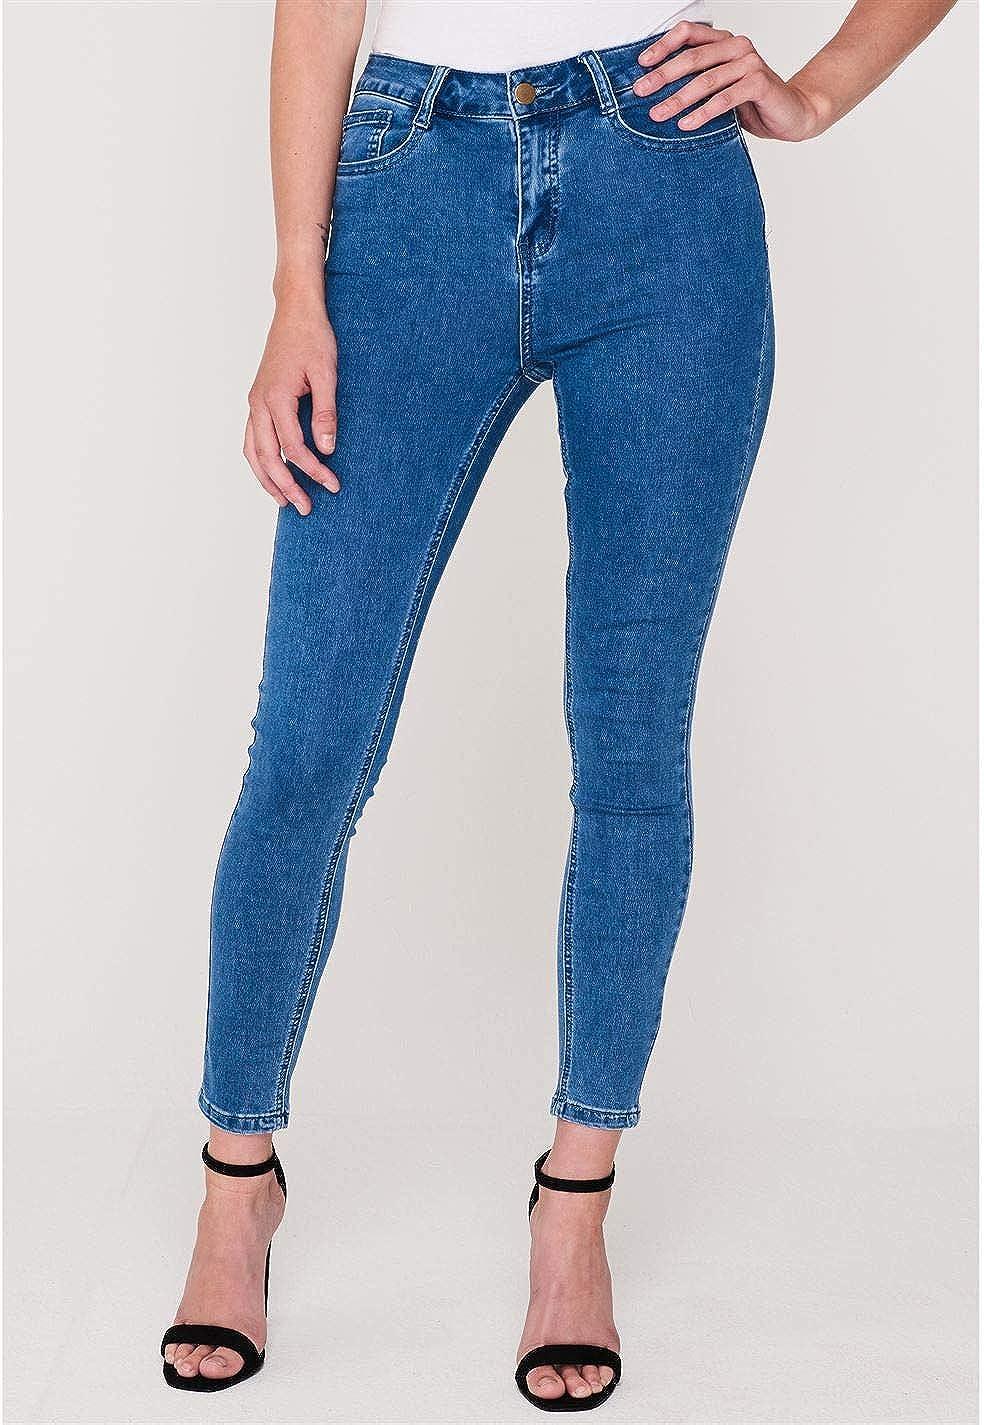 GOLDDIGGA Womens Jean Jegging Jeggings Pants Trousers